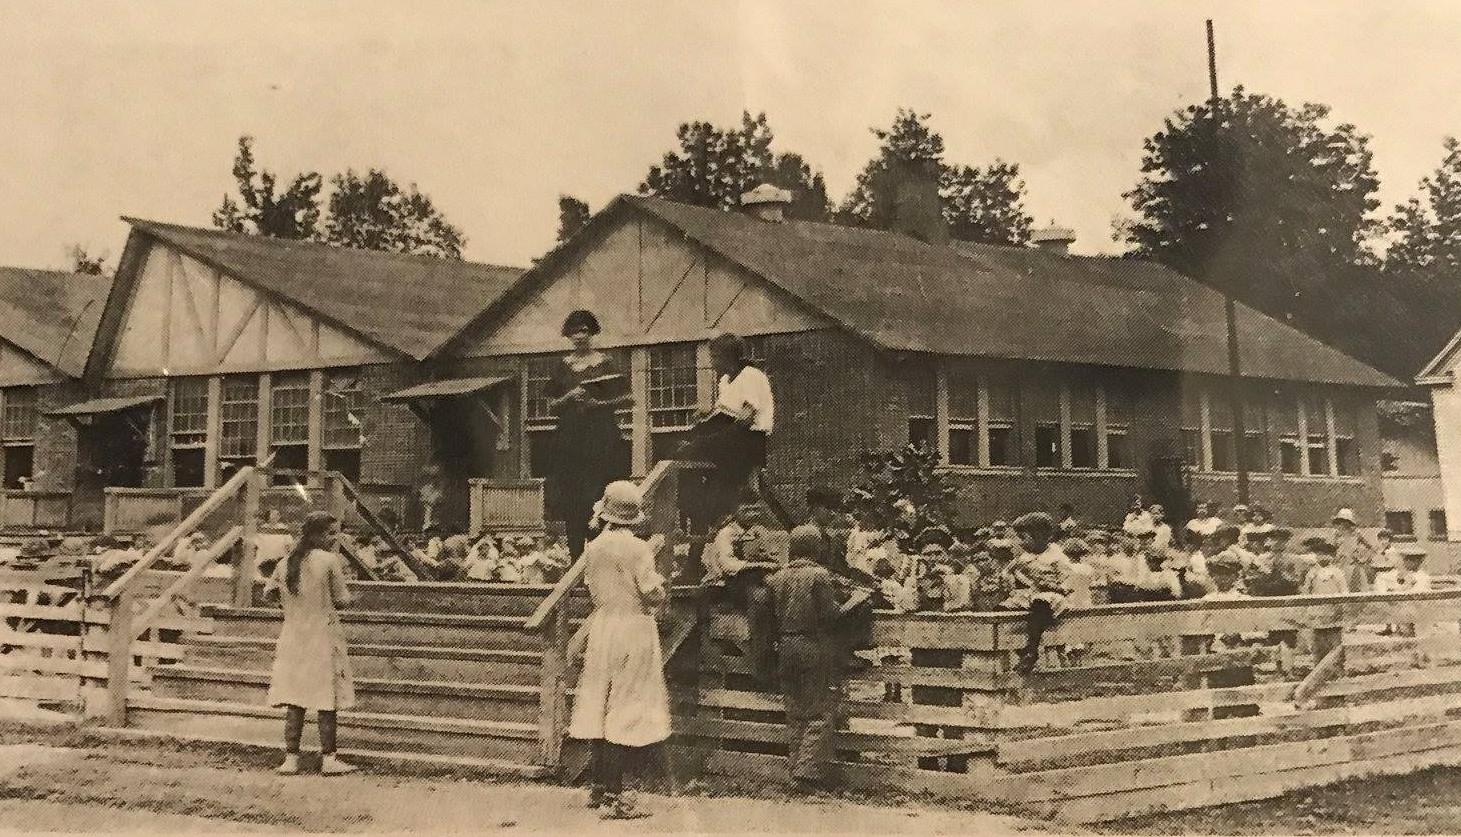 Bauxite Arkansas schoolchildren in the 1920s had dental fluorosis